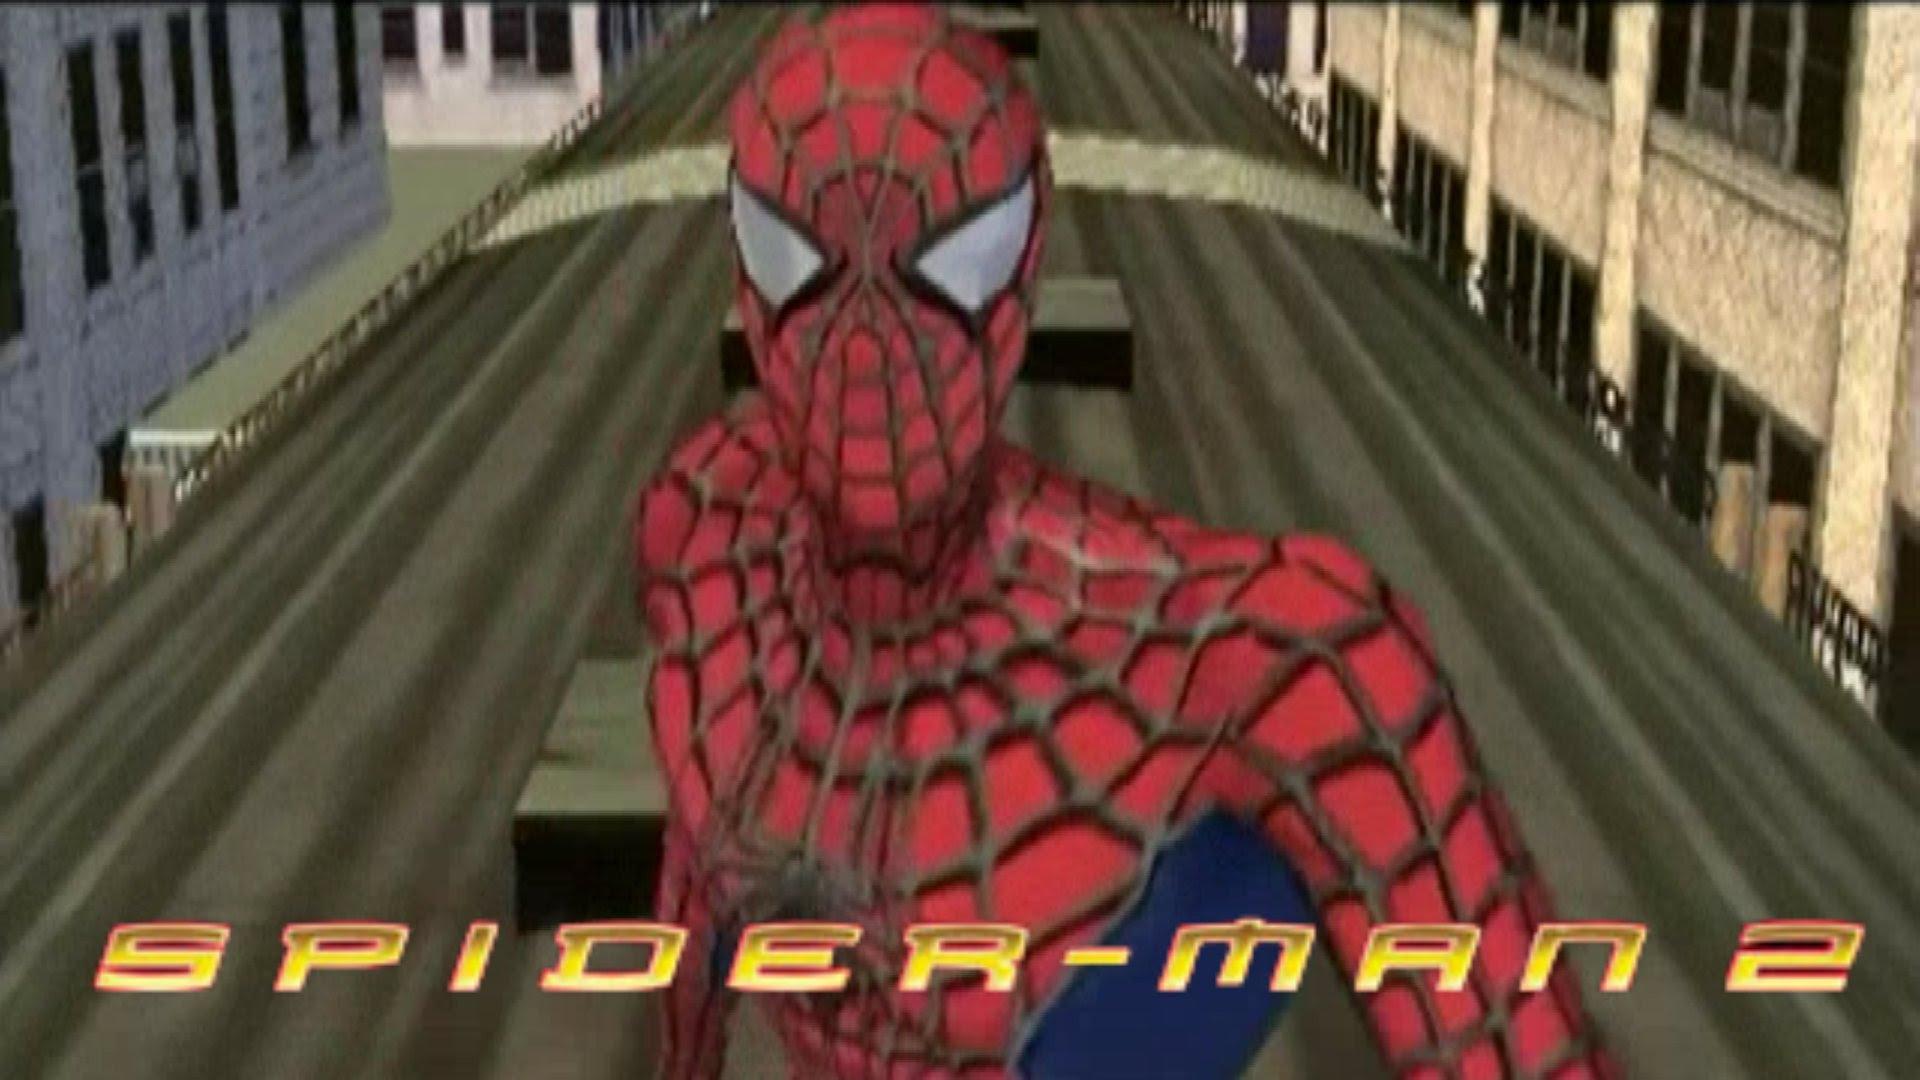 Spiderman the movie video game part 2 san diego slot machines